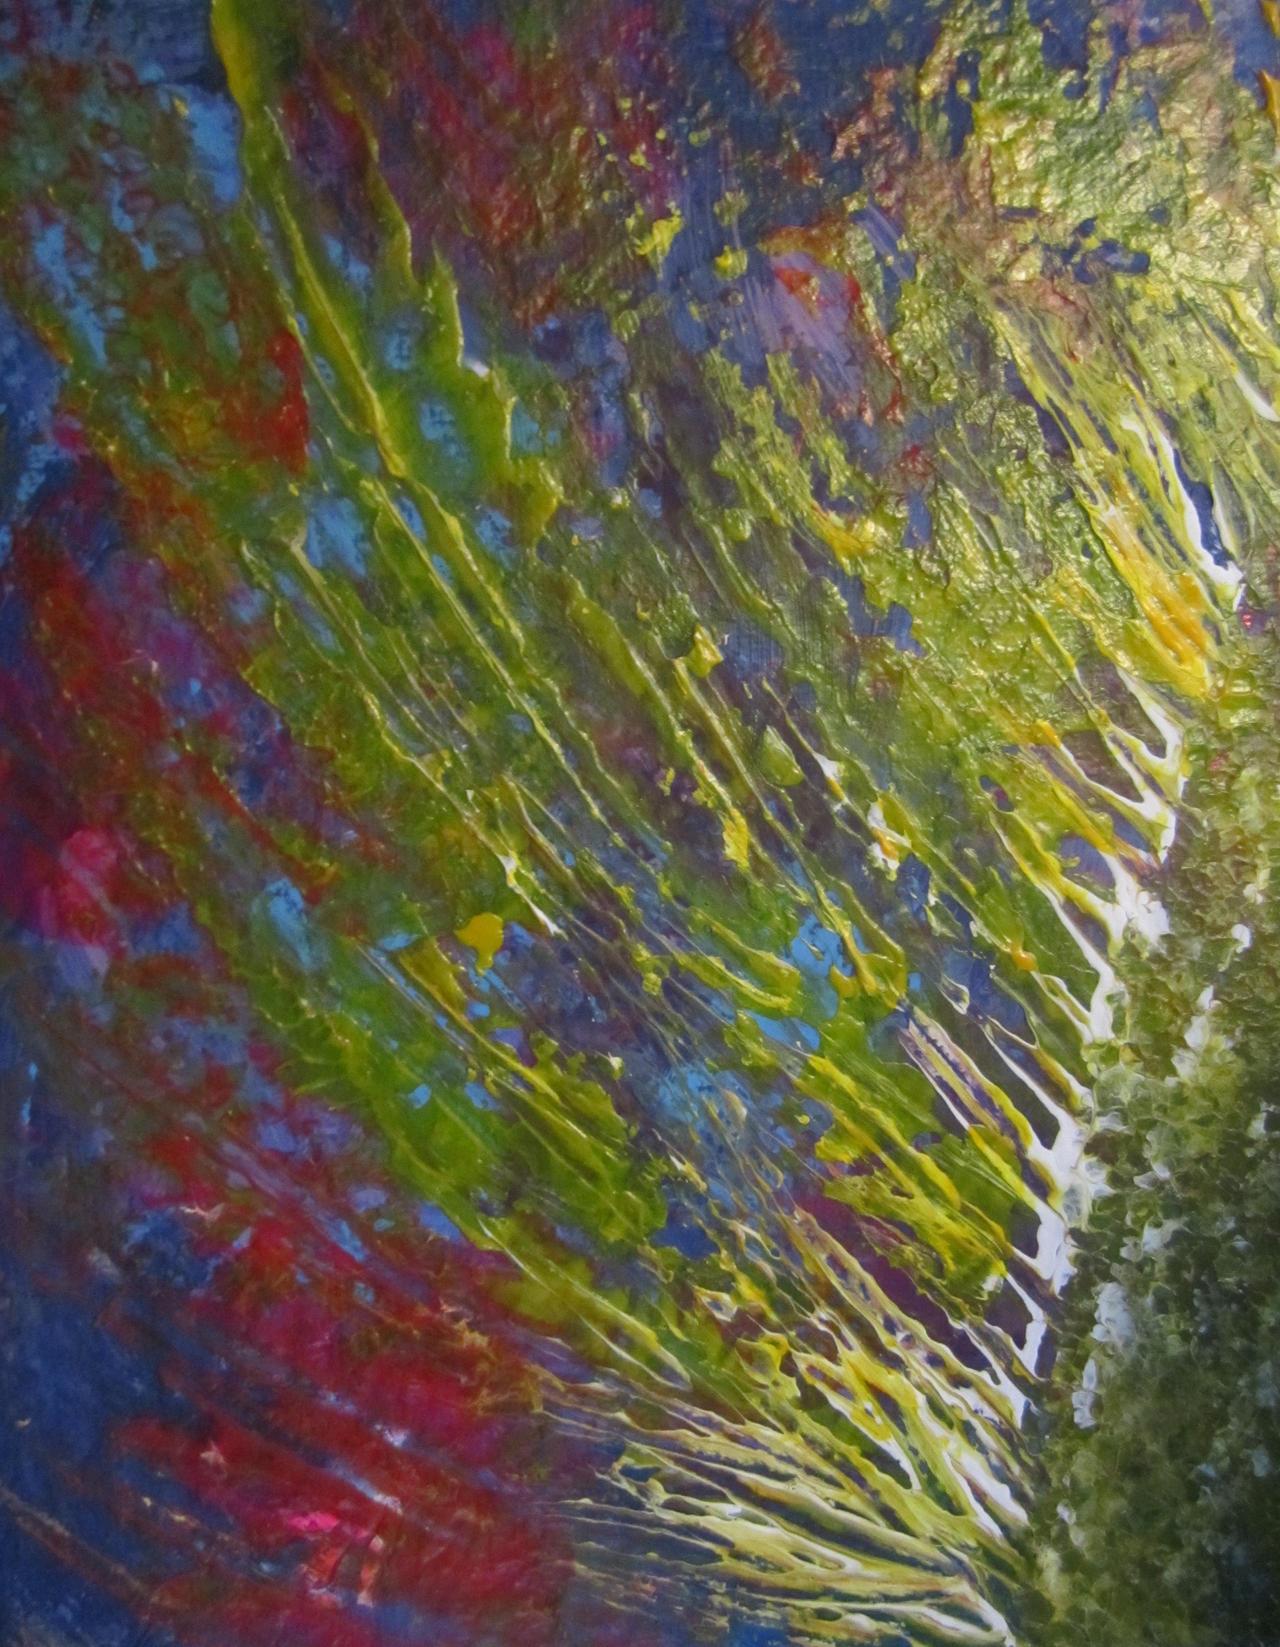 White Birch Reflection by juliarita